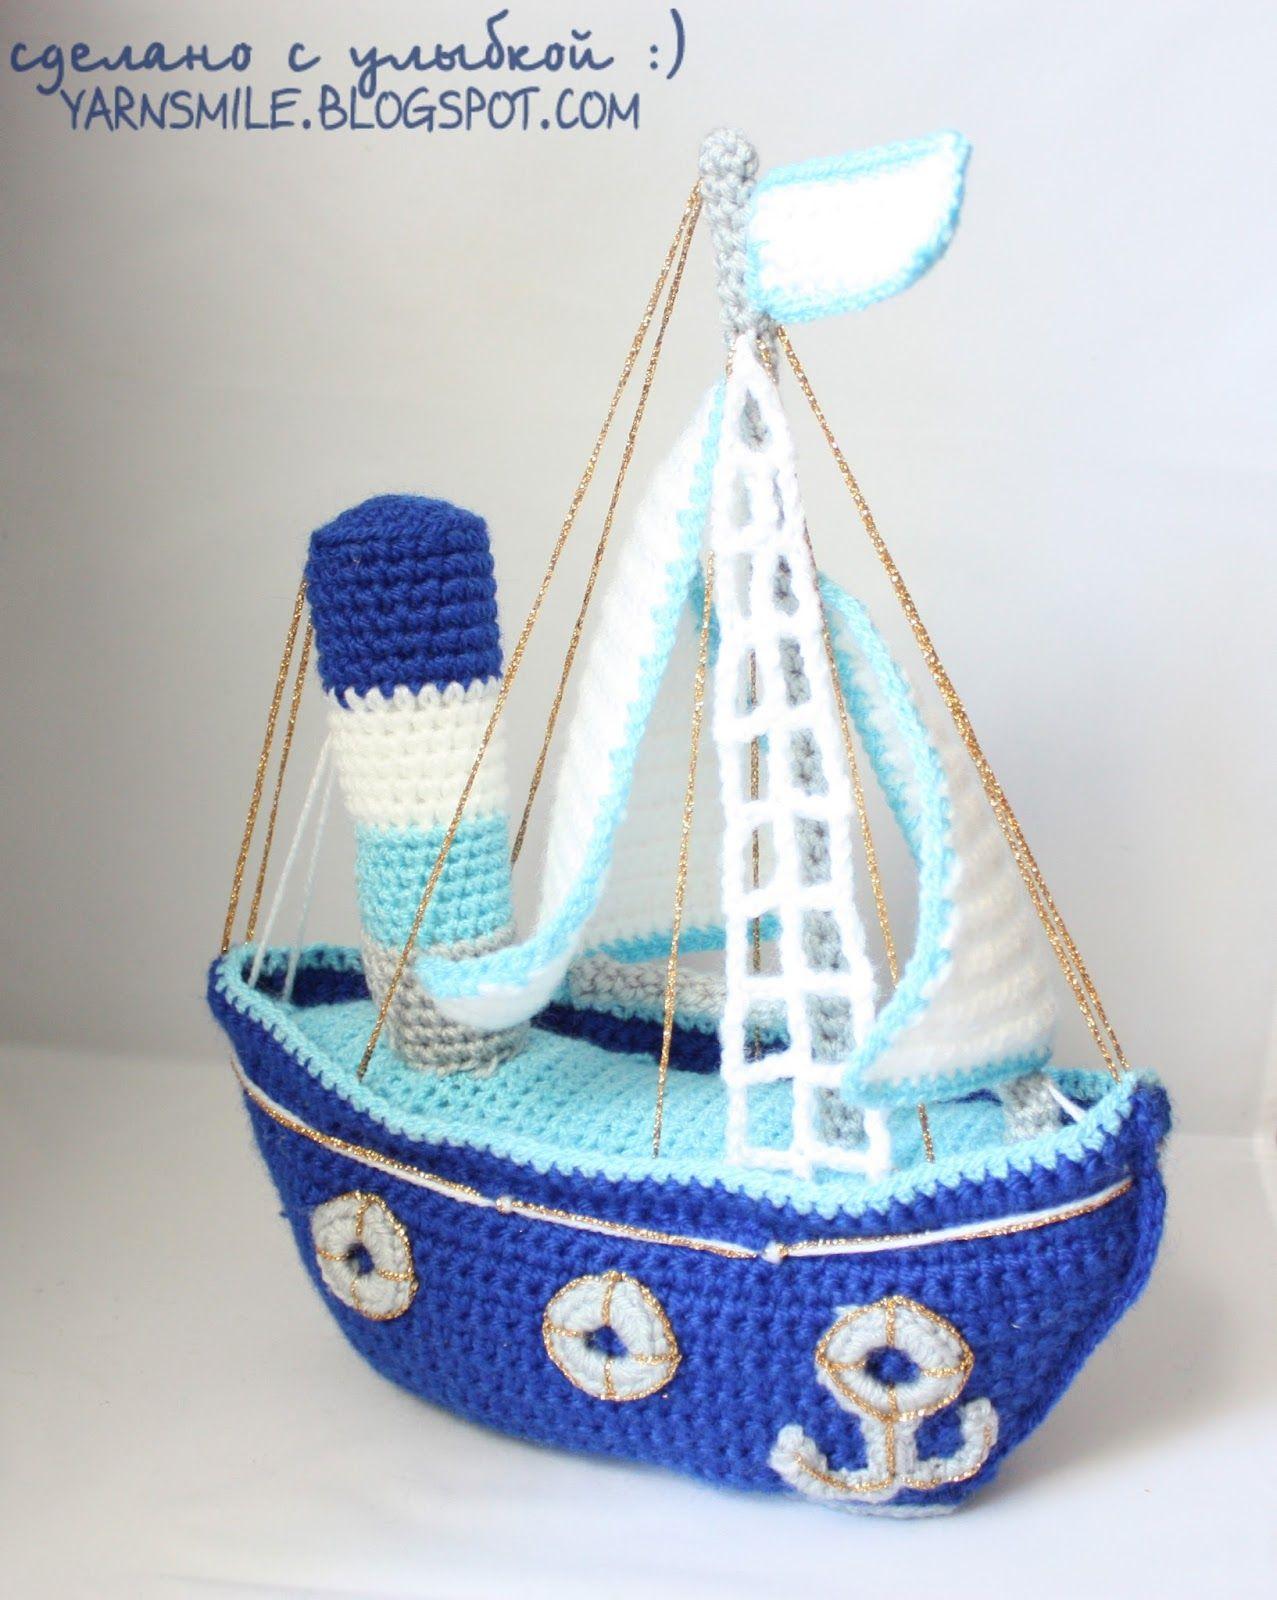 Кораблик - описание | Juguetes en Crochet | Crochet, Crochet Toys y ...